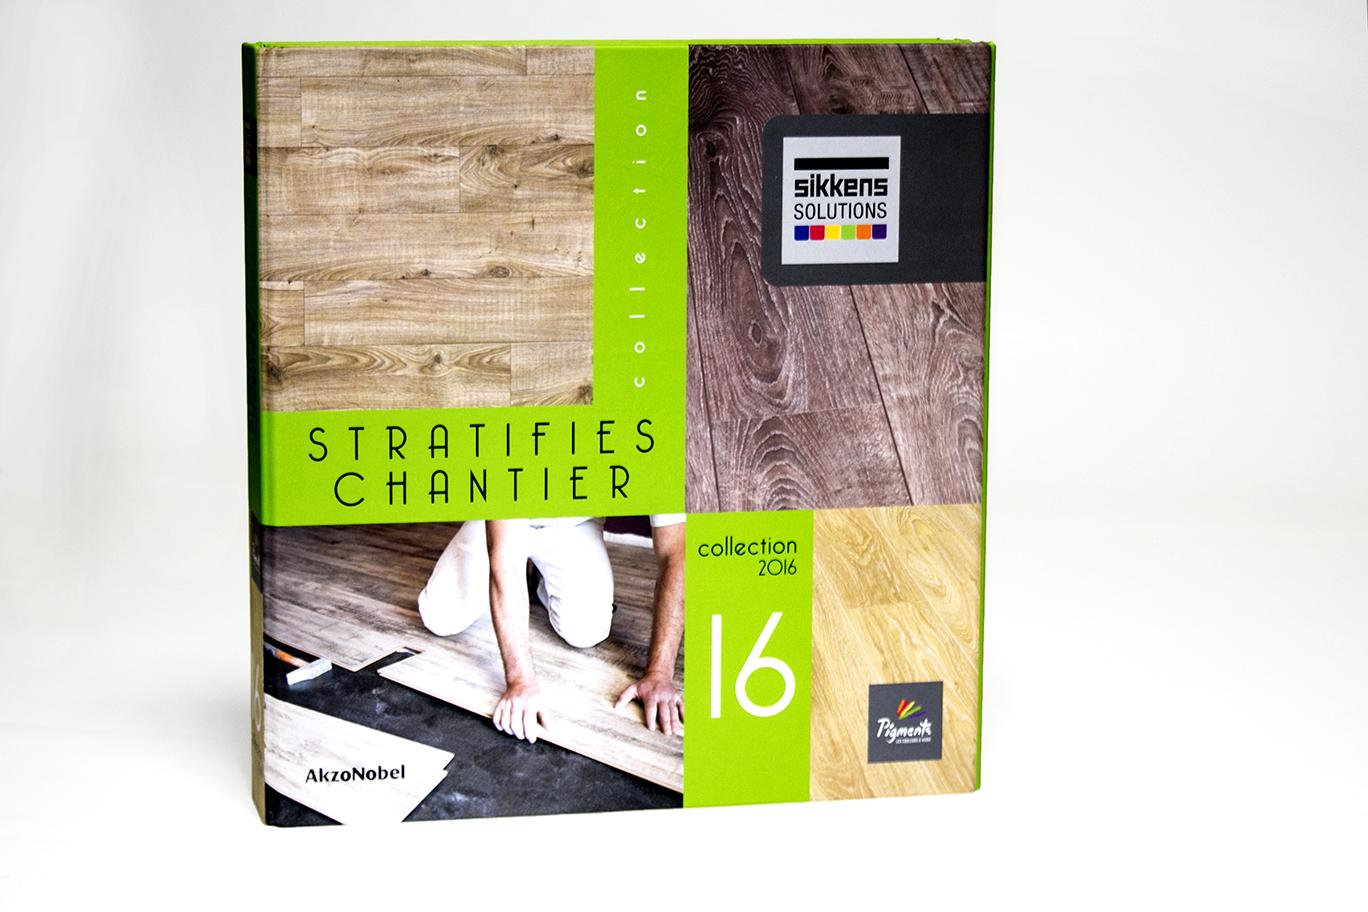 stratifies